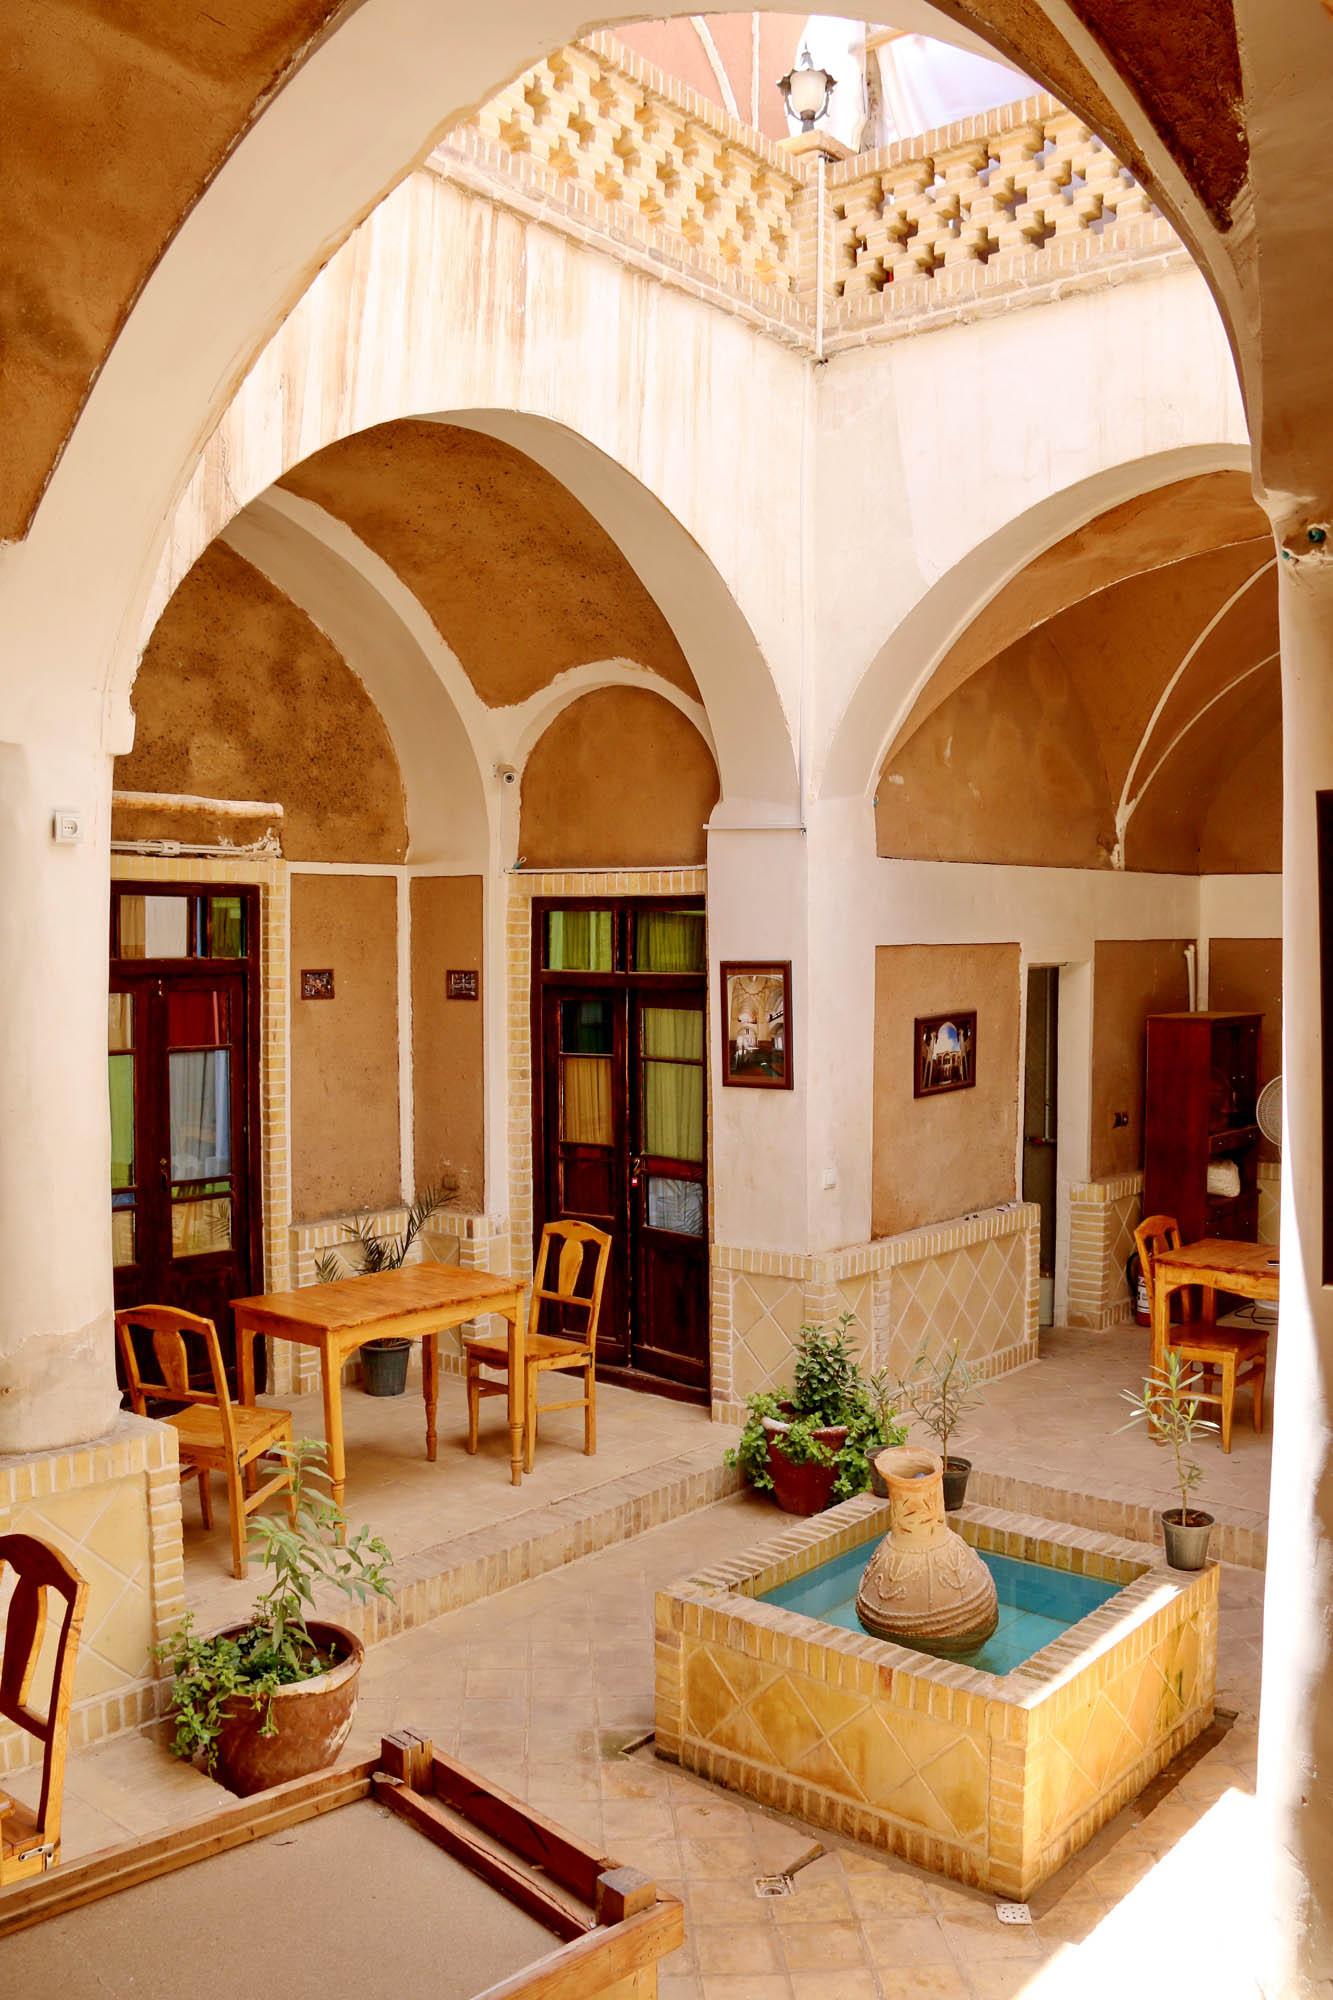 Design Of House Windows Modern Doors And: Poemas Del Río Wang: The Kamal-ol-Molk House